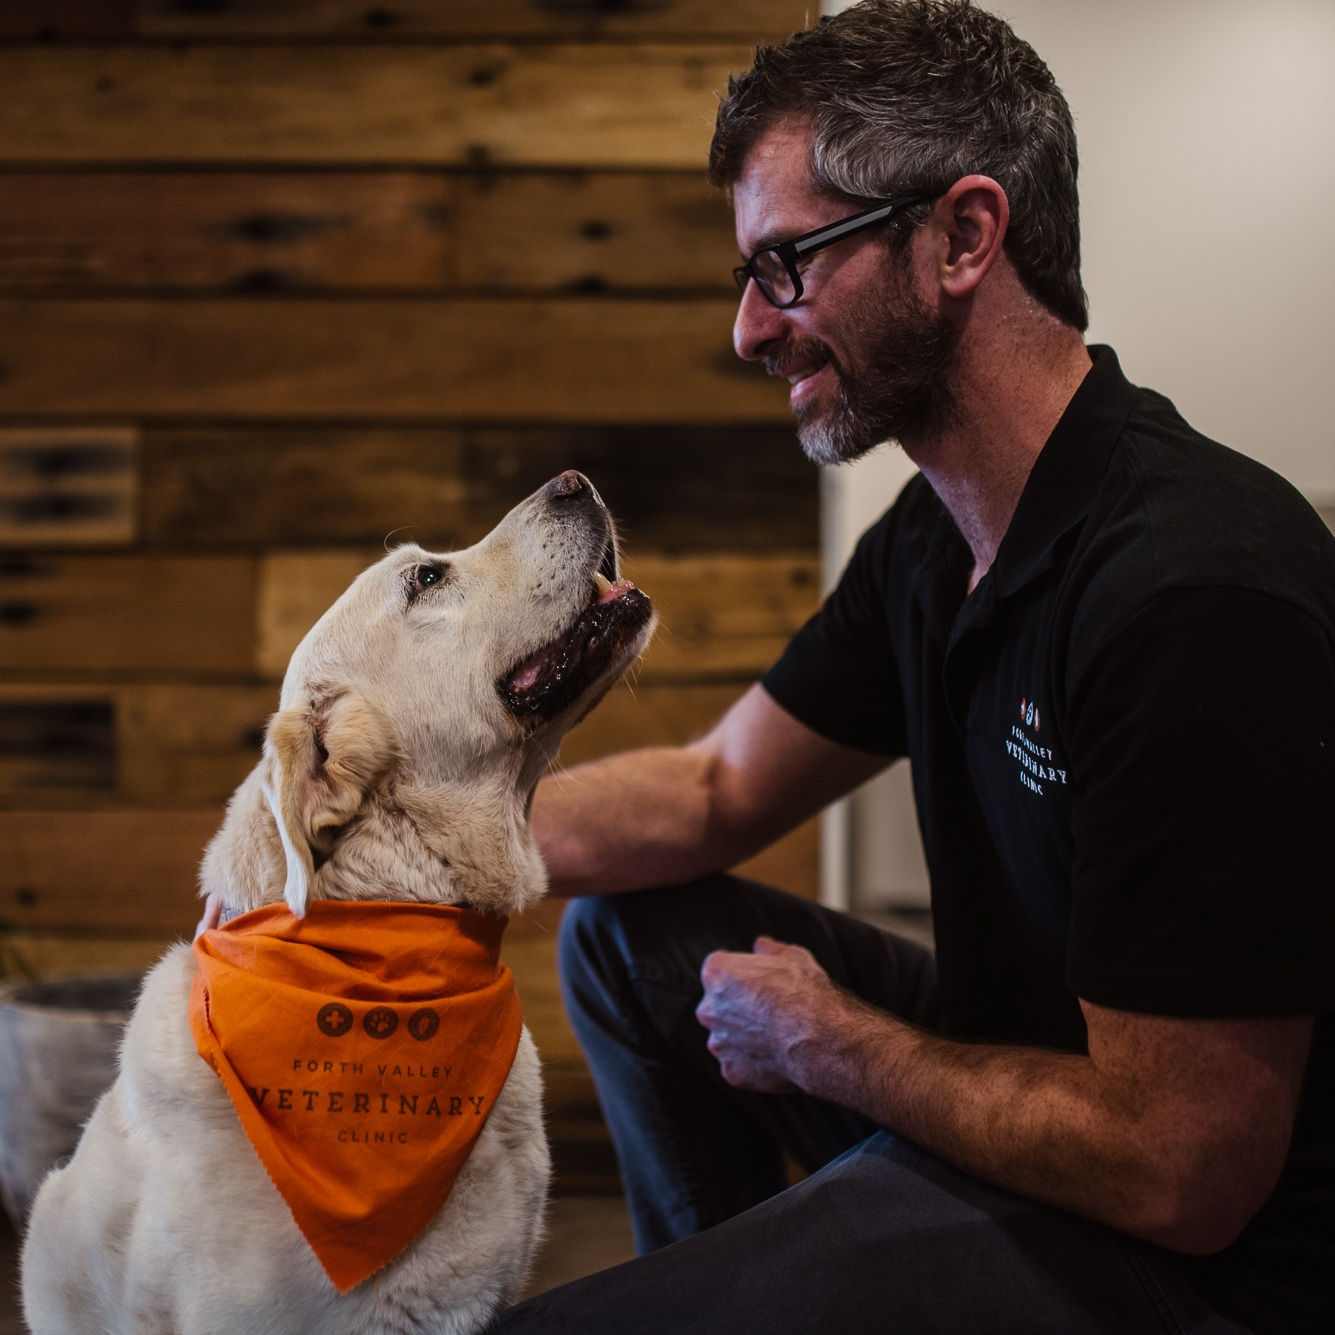 Dr Joh & dog at Vet Clinic